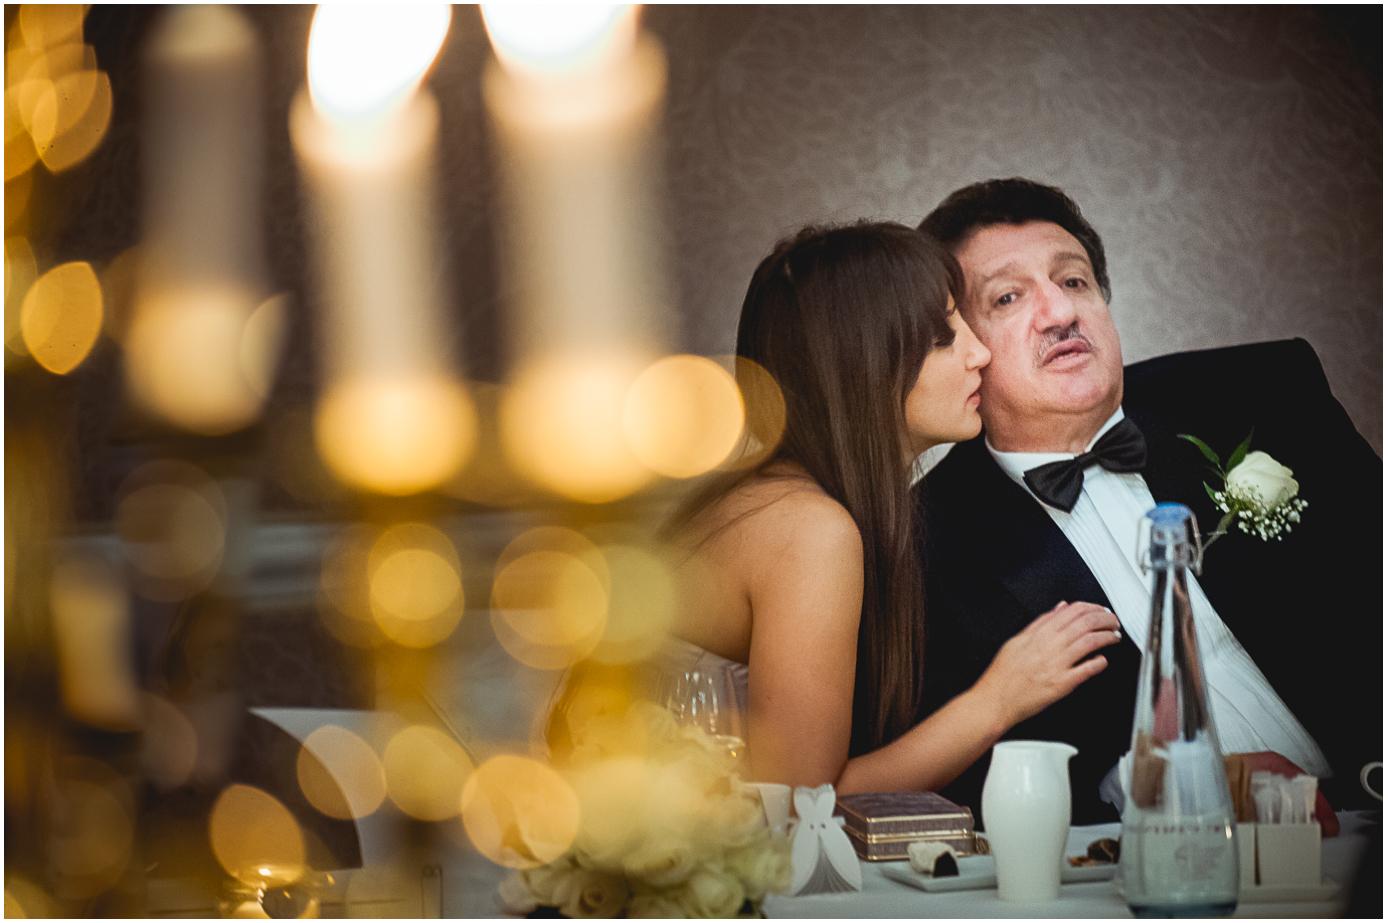 64 - Esmat and Angus - St. Ermin's Hotel London wedding photographer